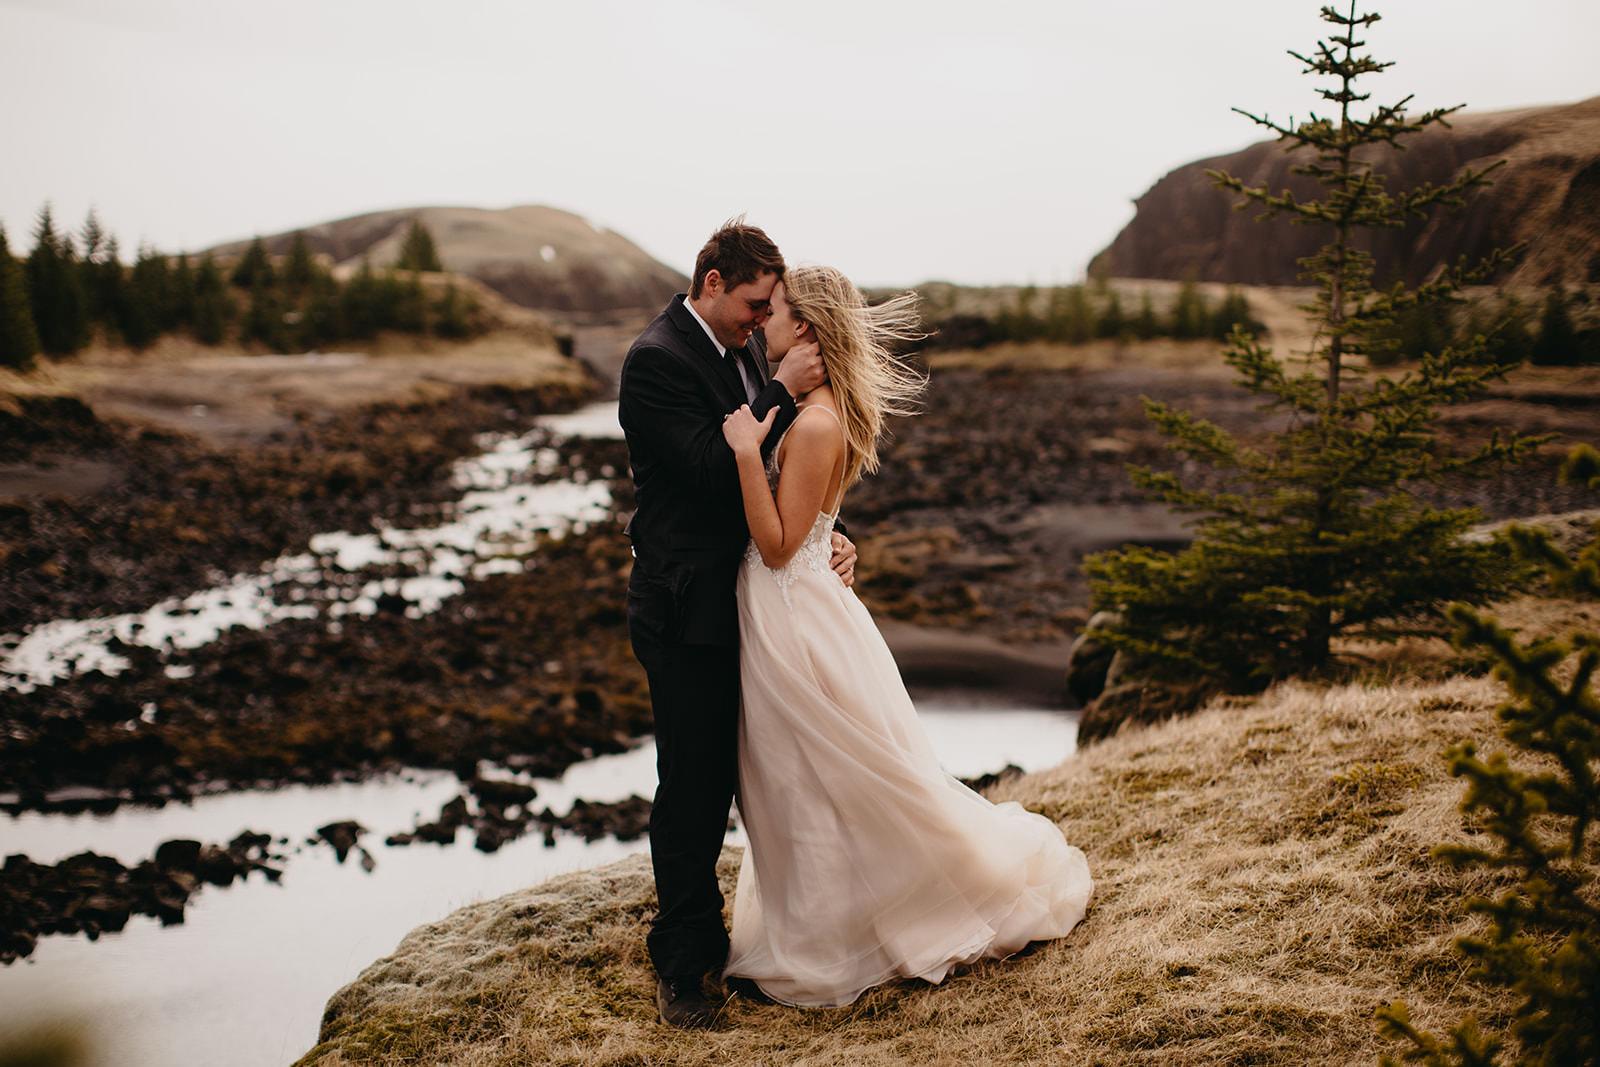 Icelandic Iceland Elopement Wedding Elope Photographer Eloping Reykjavík Vik Black Sand Beach Jökulsárlón Skogafoss Waterfall Vestrahorn Mountain Liz Osban Photography Destination 66.jpg